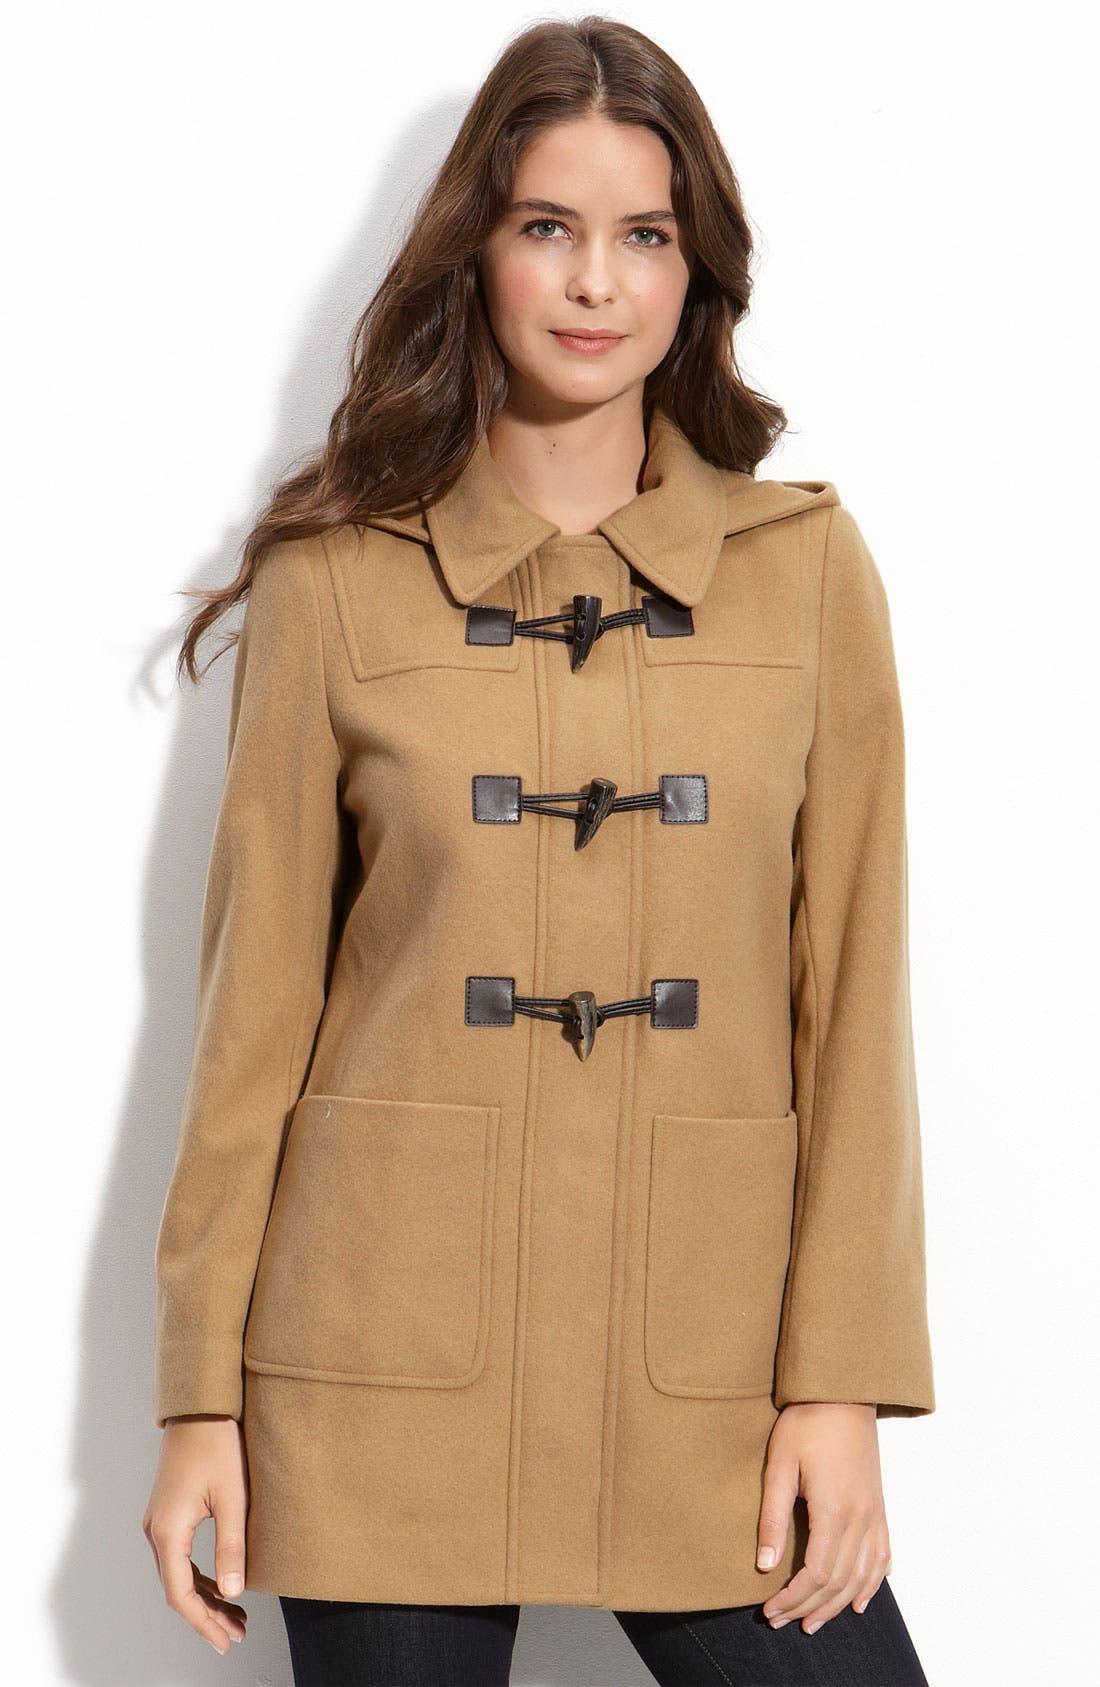 Alternate Image 1 Selected - MICHAEL Michael Kors Toggle Coat with Detachable Hood (Petite)